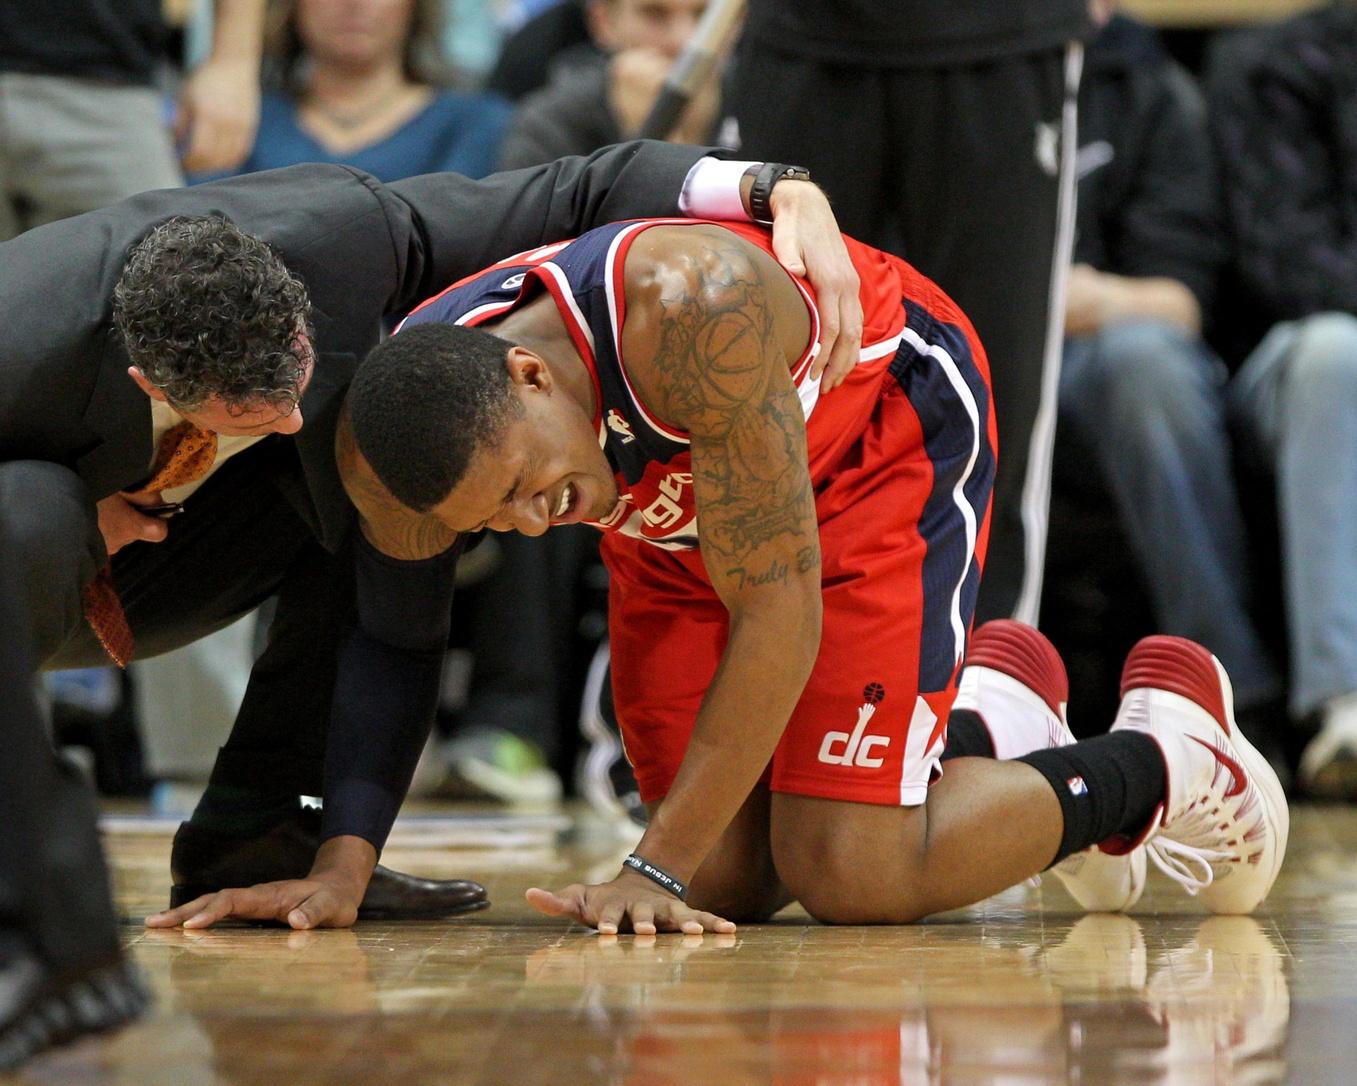 Injuries mar NBA season again - Crossover Chronicles